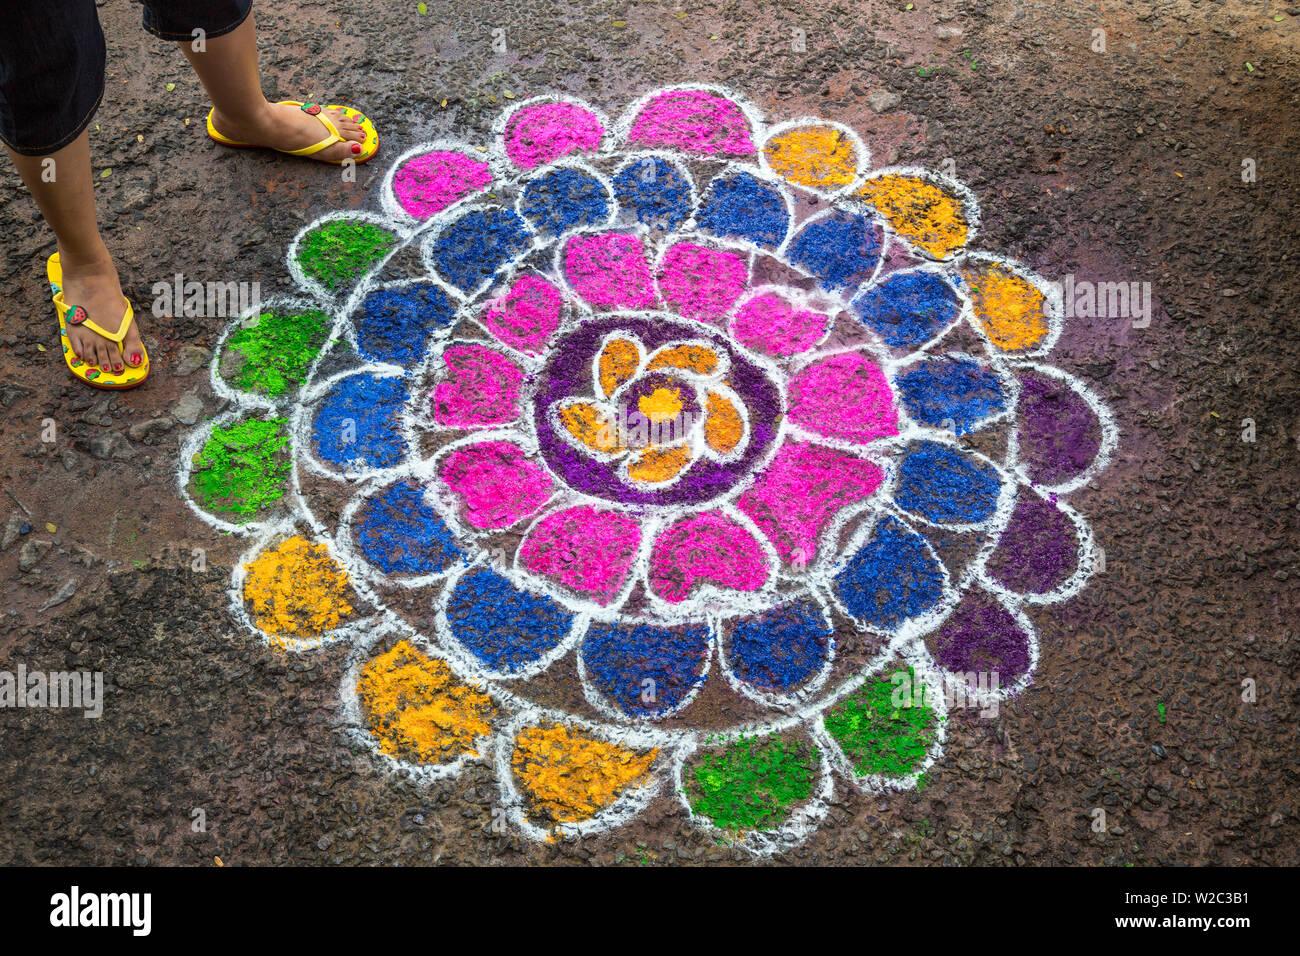 Rangoli design (or Kolam or Muggu) on street to welcome hindu deities, Pondicherry (Puducherry), Tamil Nadu, India Stock Photo